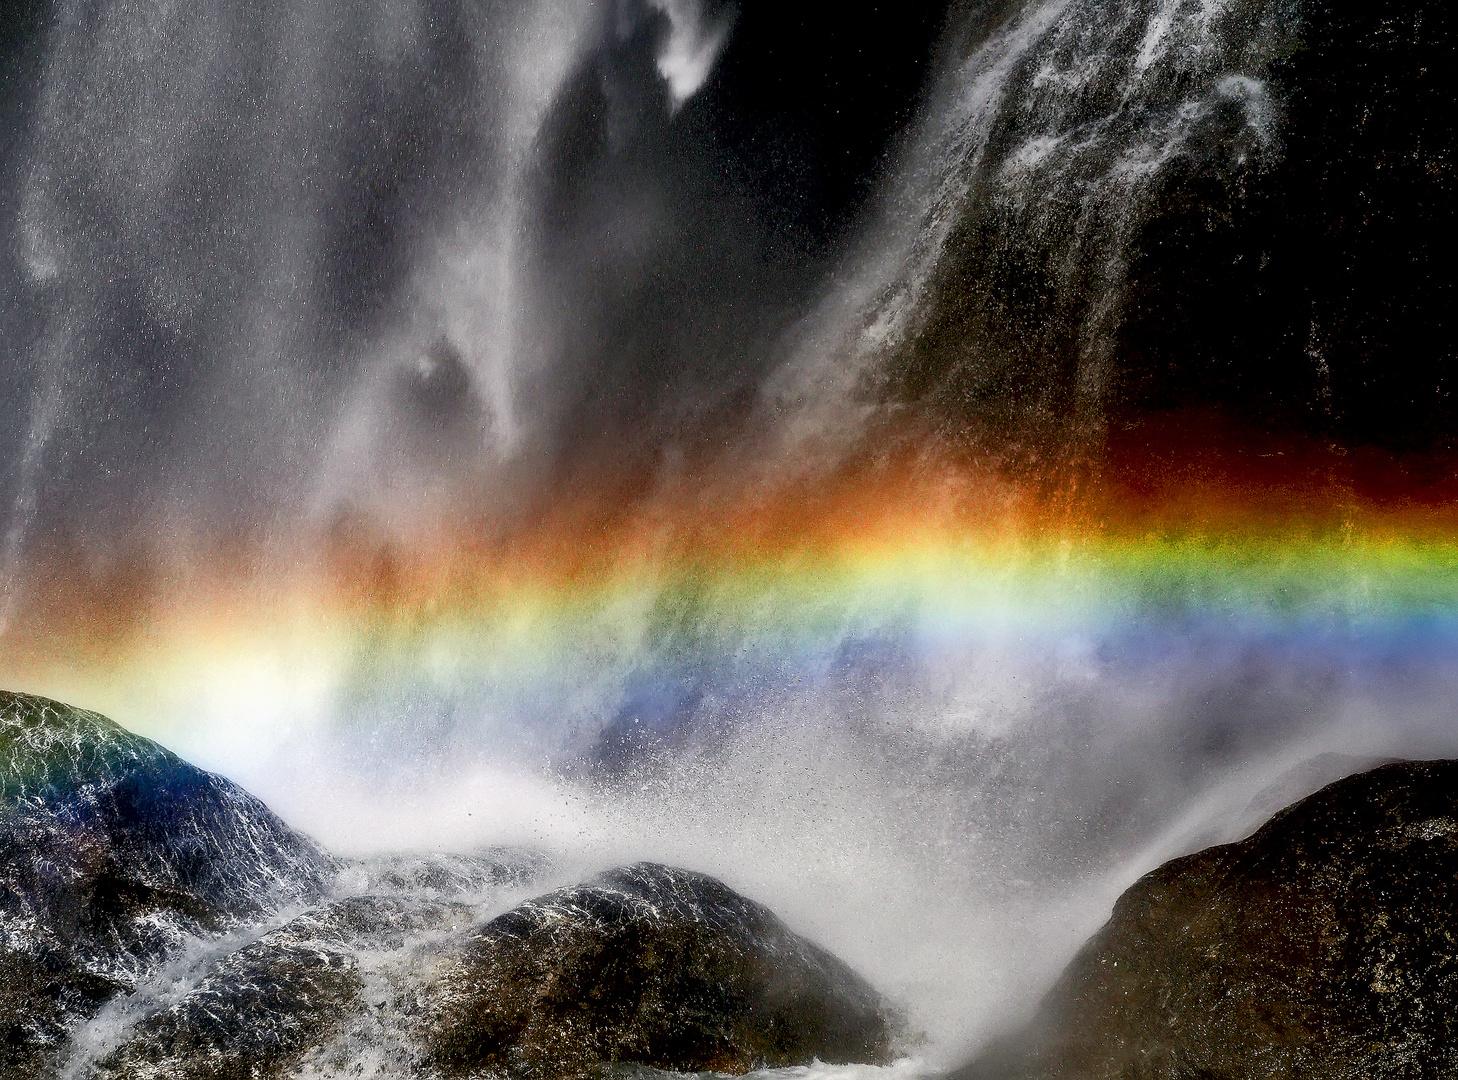 Regenbogen-Poésie im Wasserfall! - La naissance d'un arc-en-ciel!